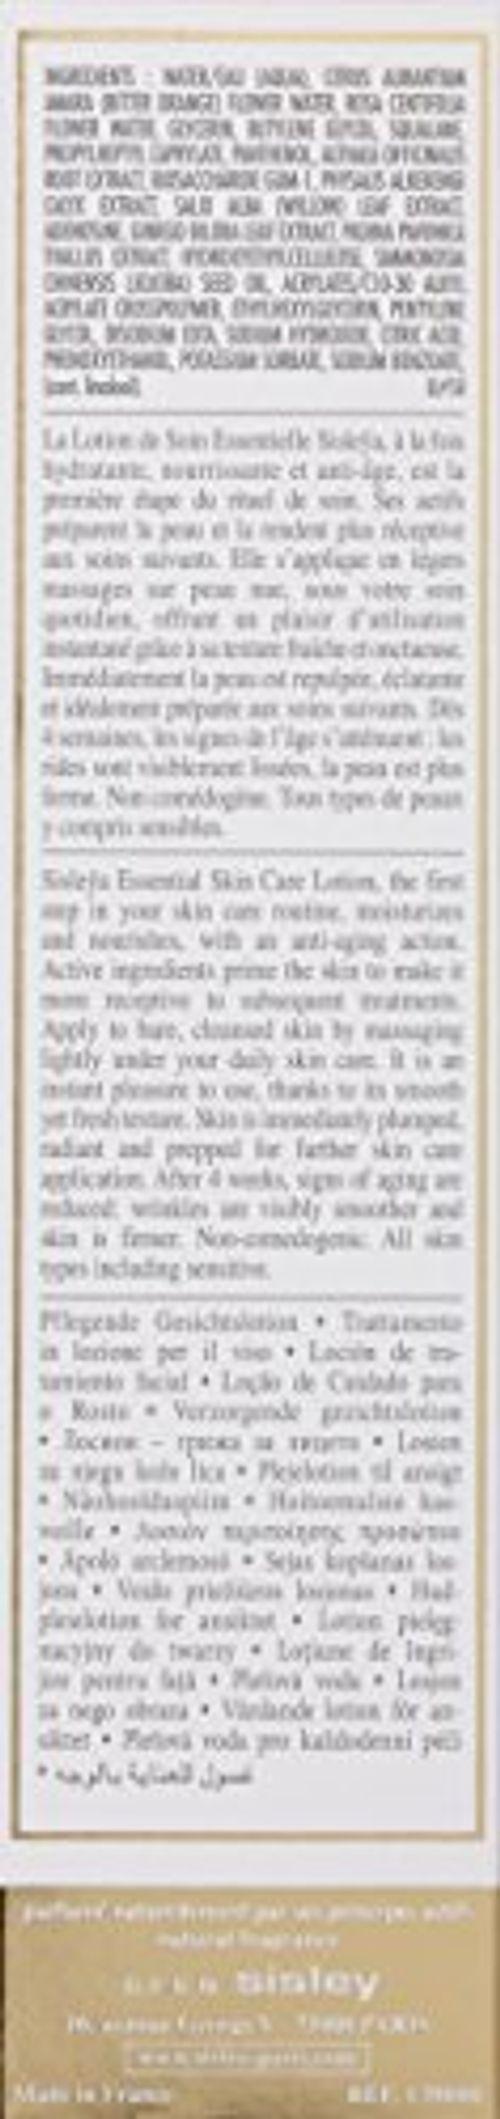 photo Wallpaper of Sisley-Sisley Essential Skin Care Lotion   150 Ml-normal